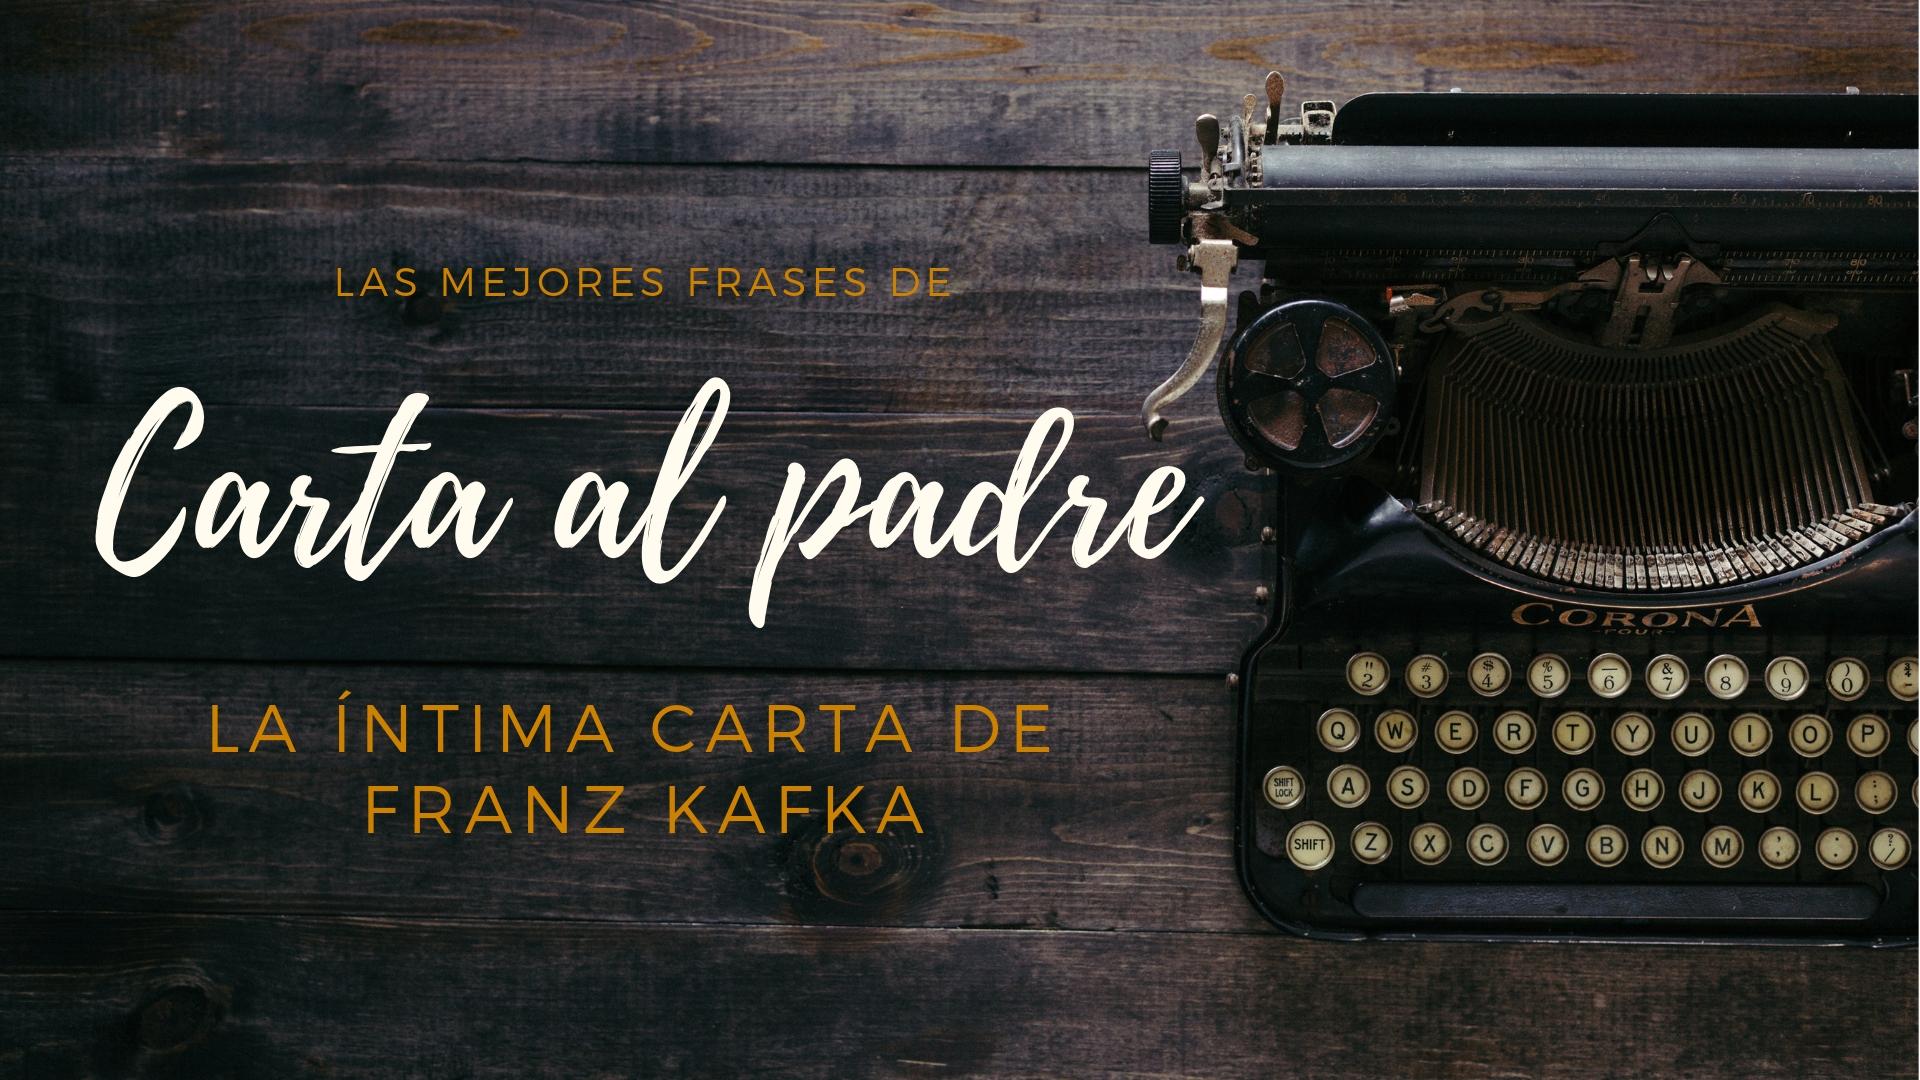 Frases Carta al padre Franz Kafka.jpg